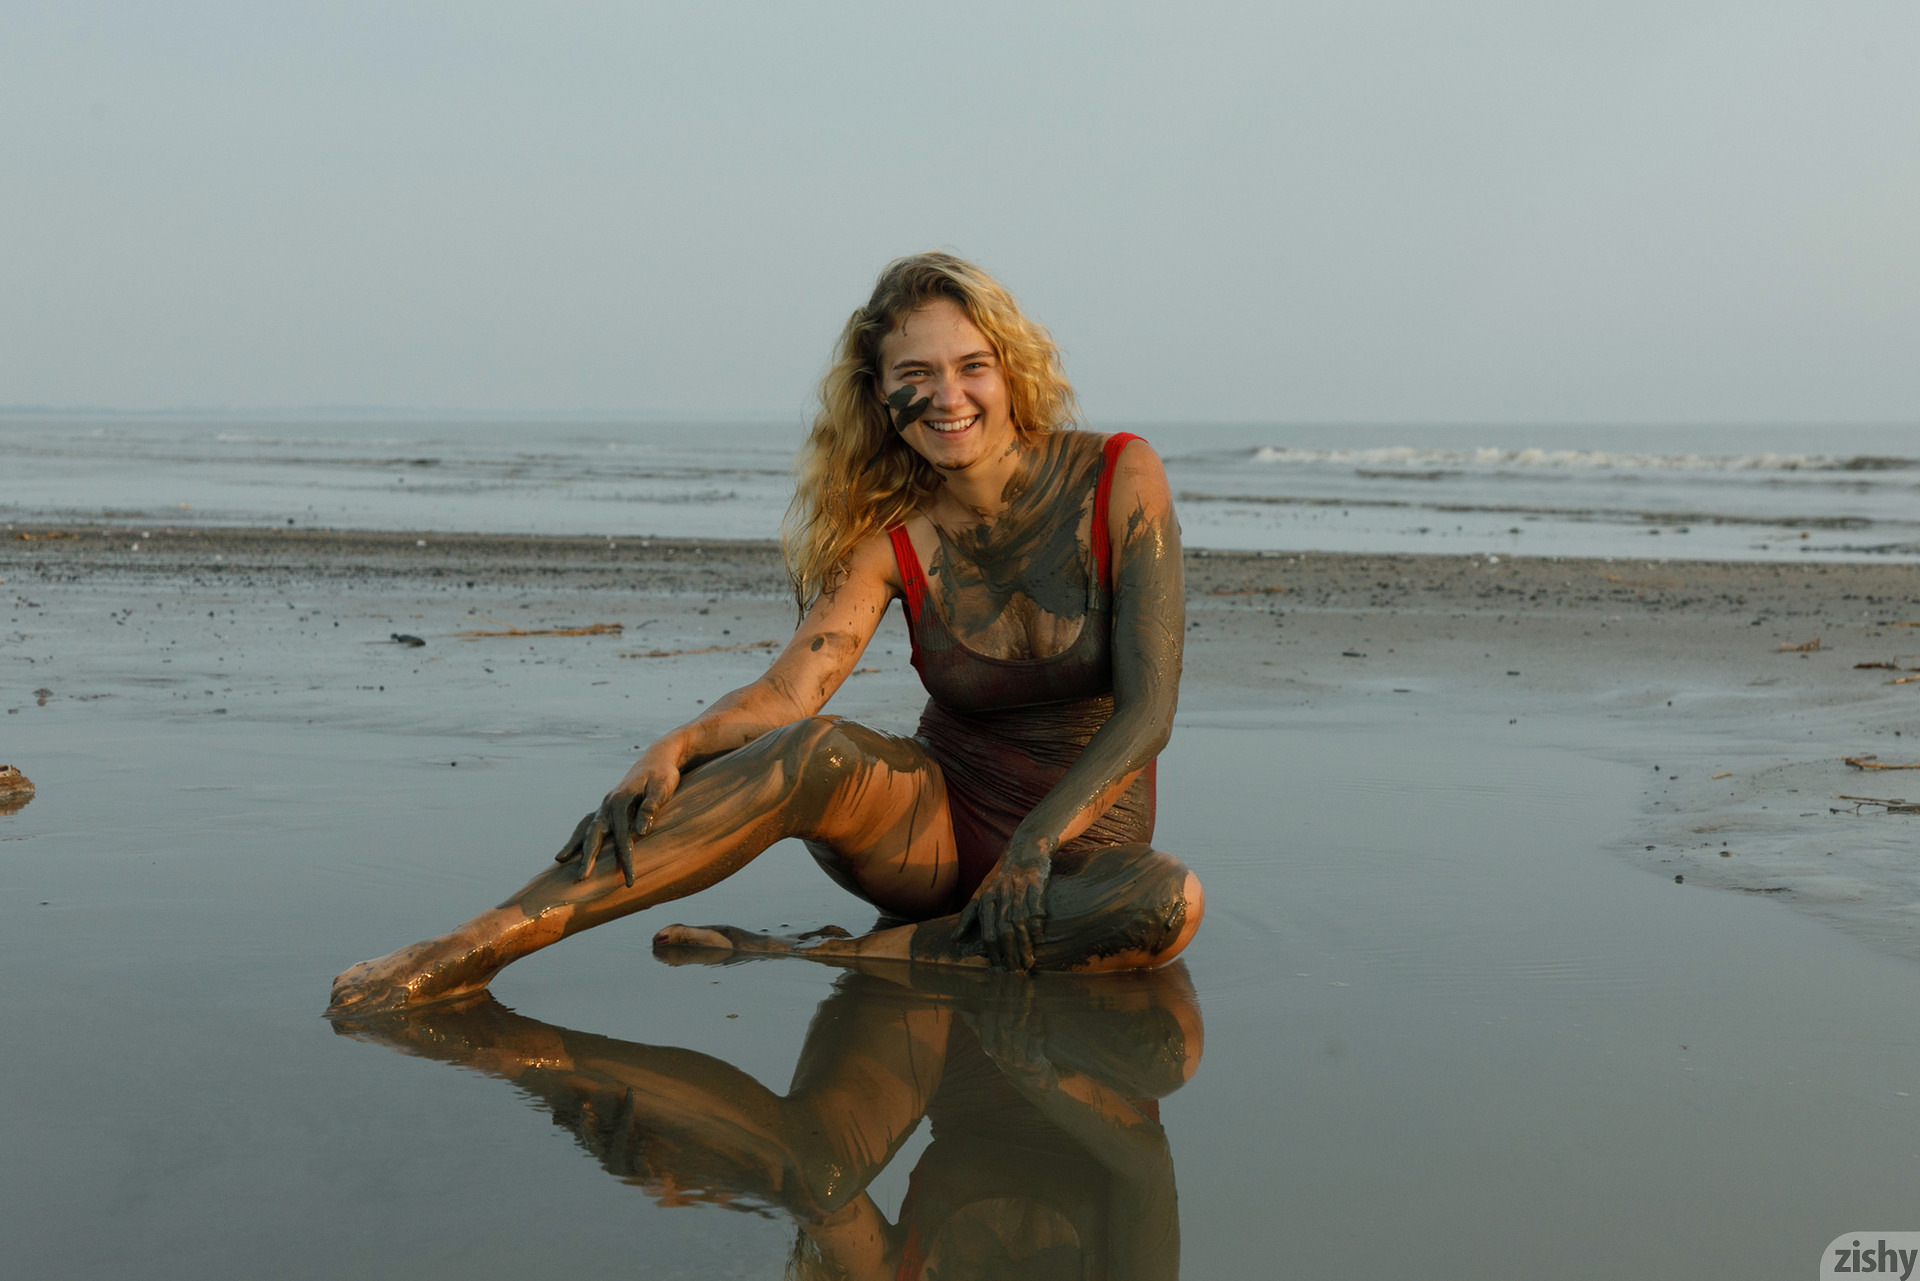 Sofia Orlova On Gryaznyy Beach Zishy (35)